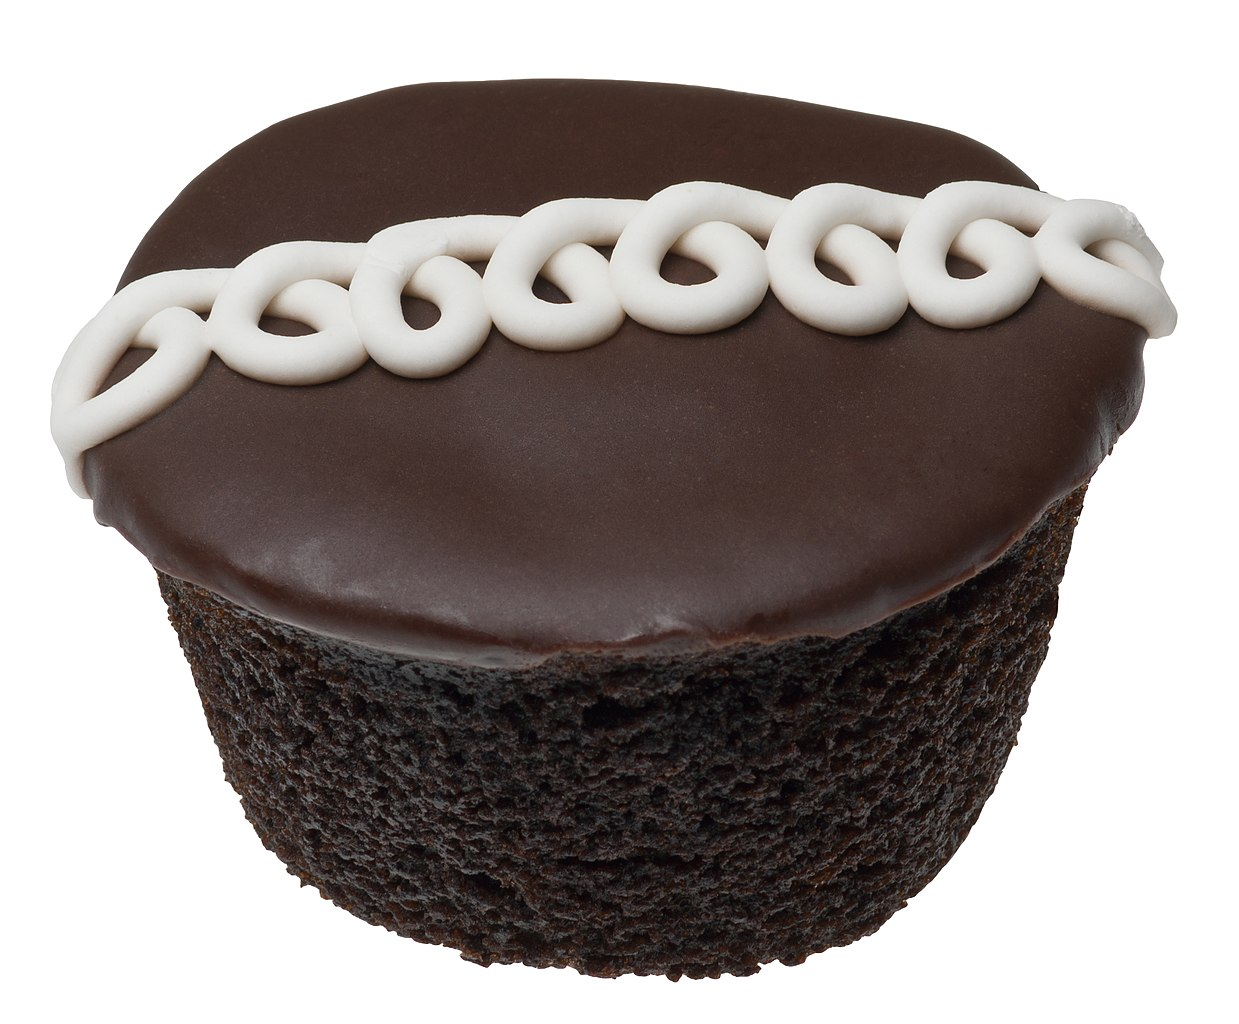 File:Hostess-Cupcake-Whole.jpg